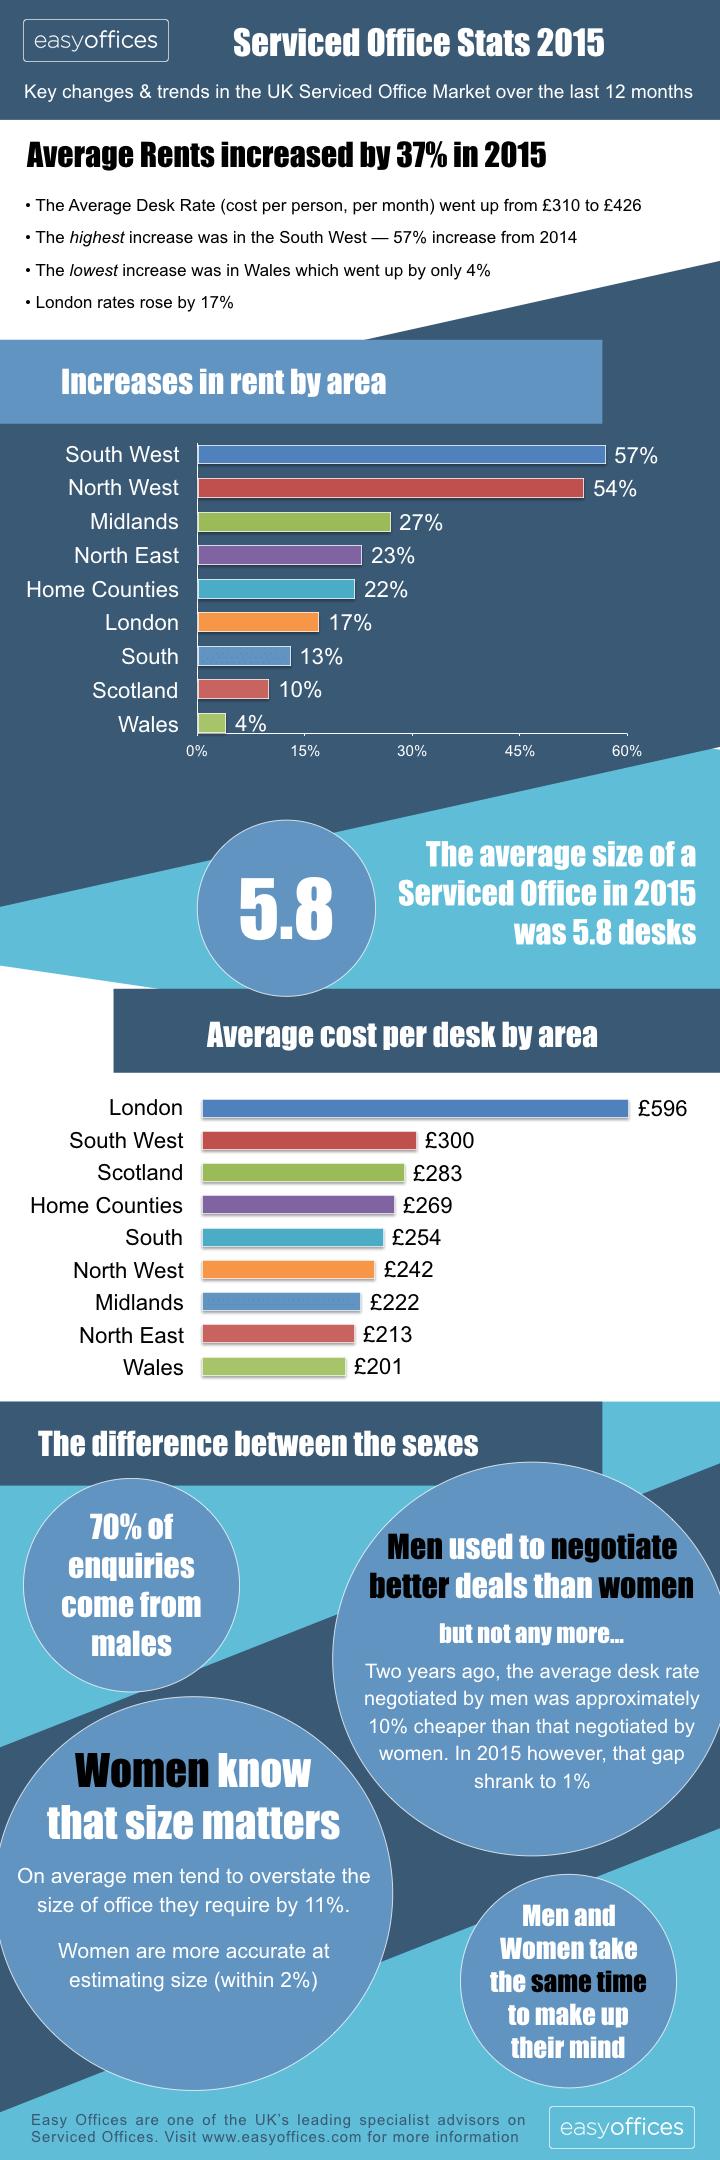 UK serviced office statistics 2015